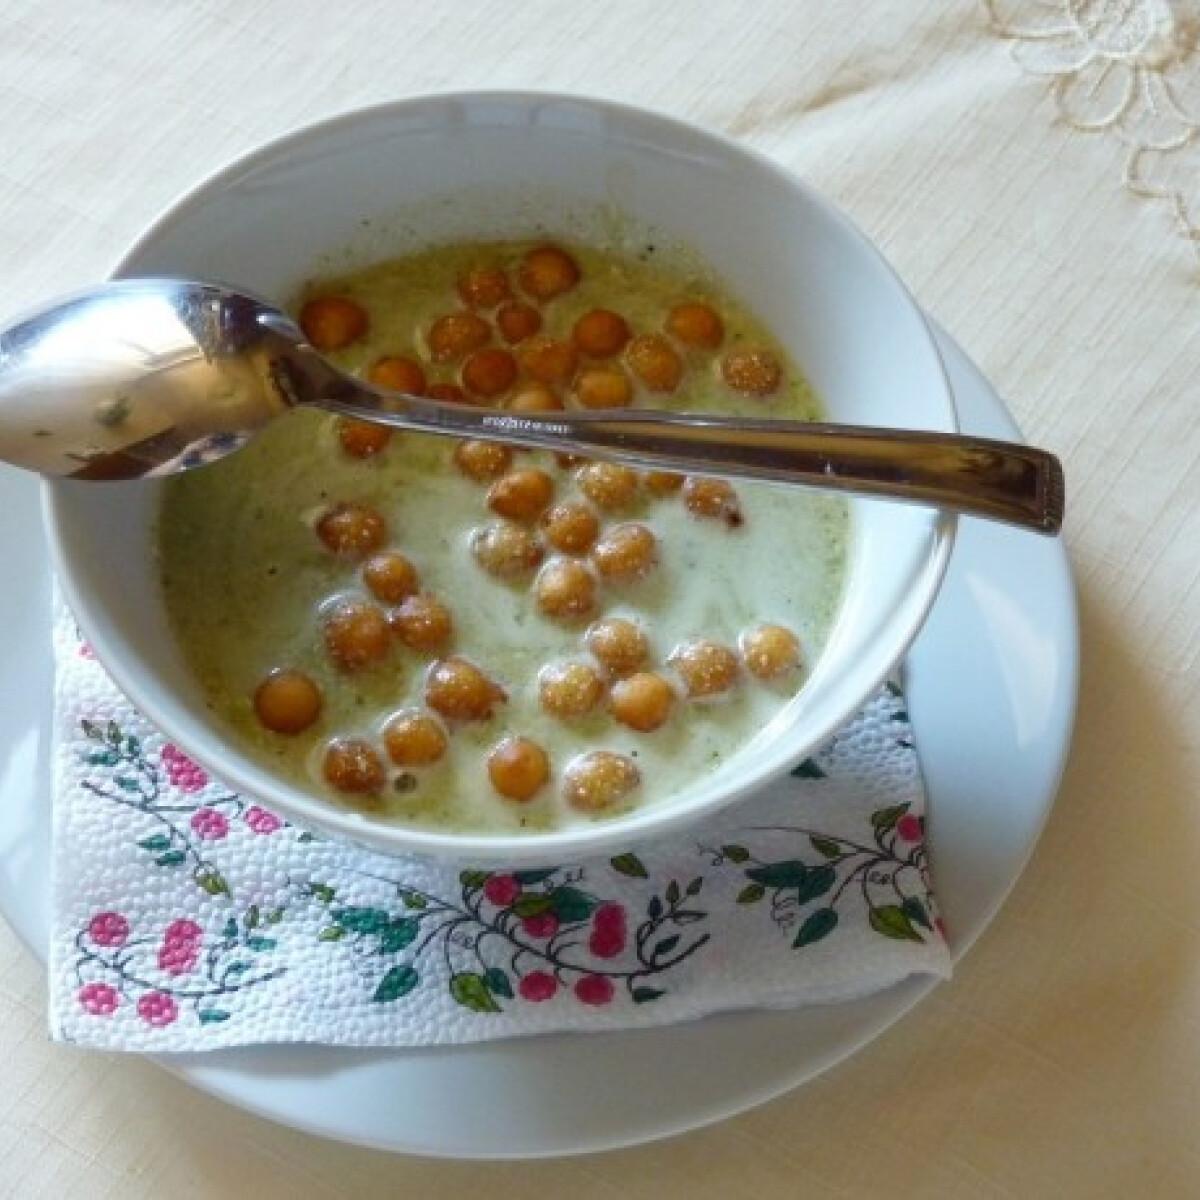 Sajtos brokkolileves Zsanna konyhájából